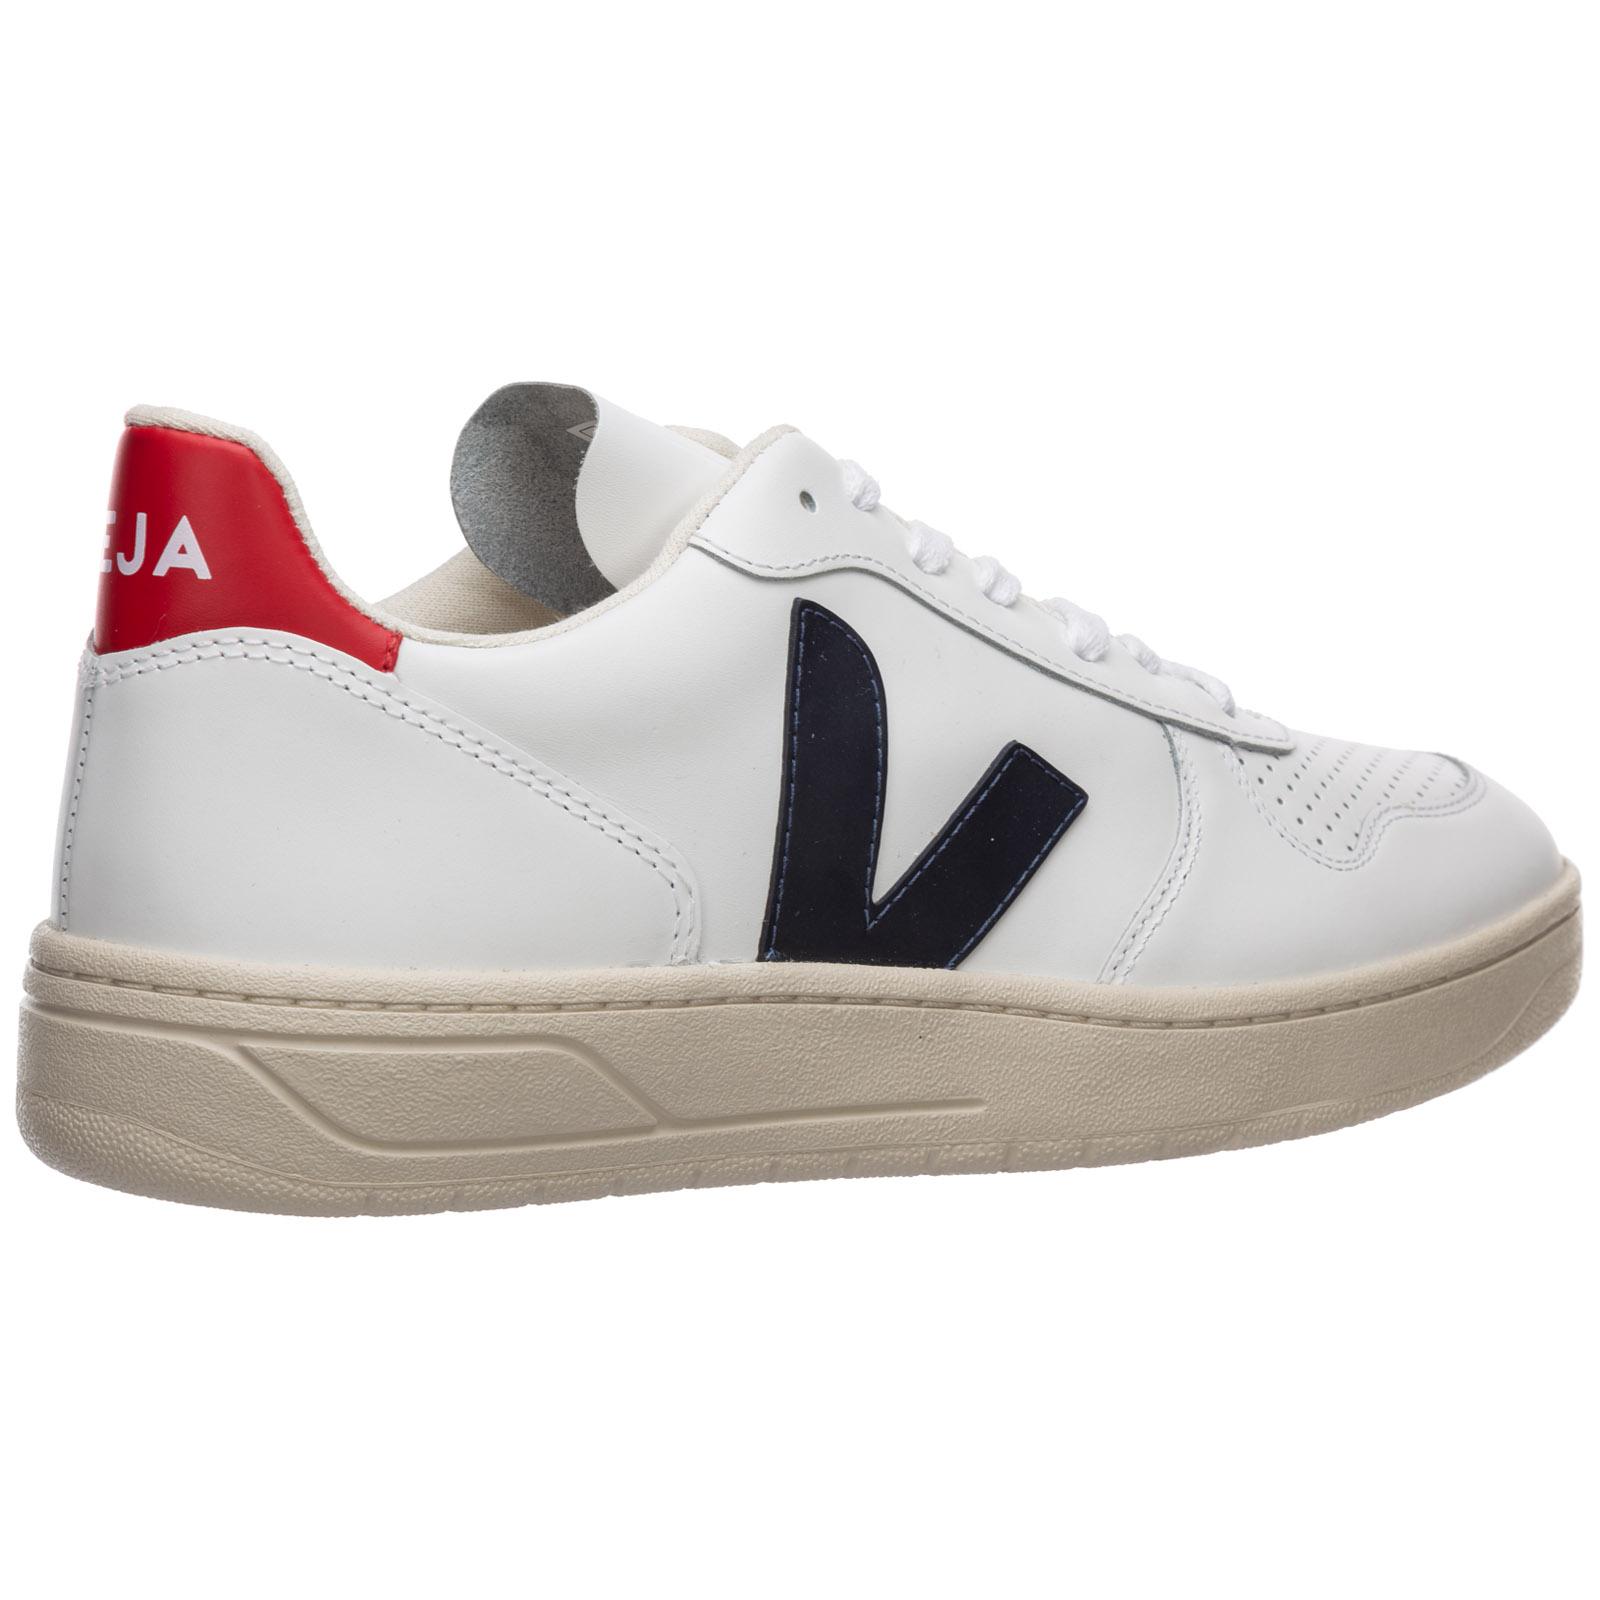 Sneakers Veja v-10 VX021267 extra white